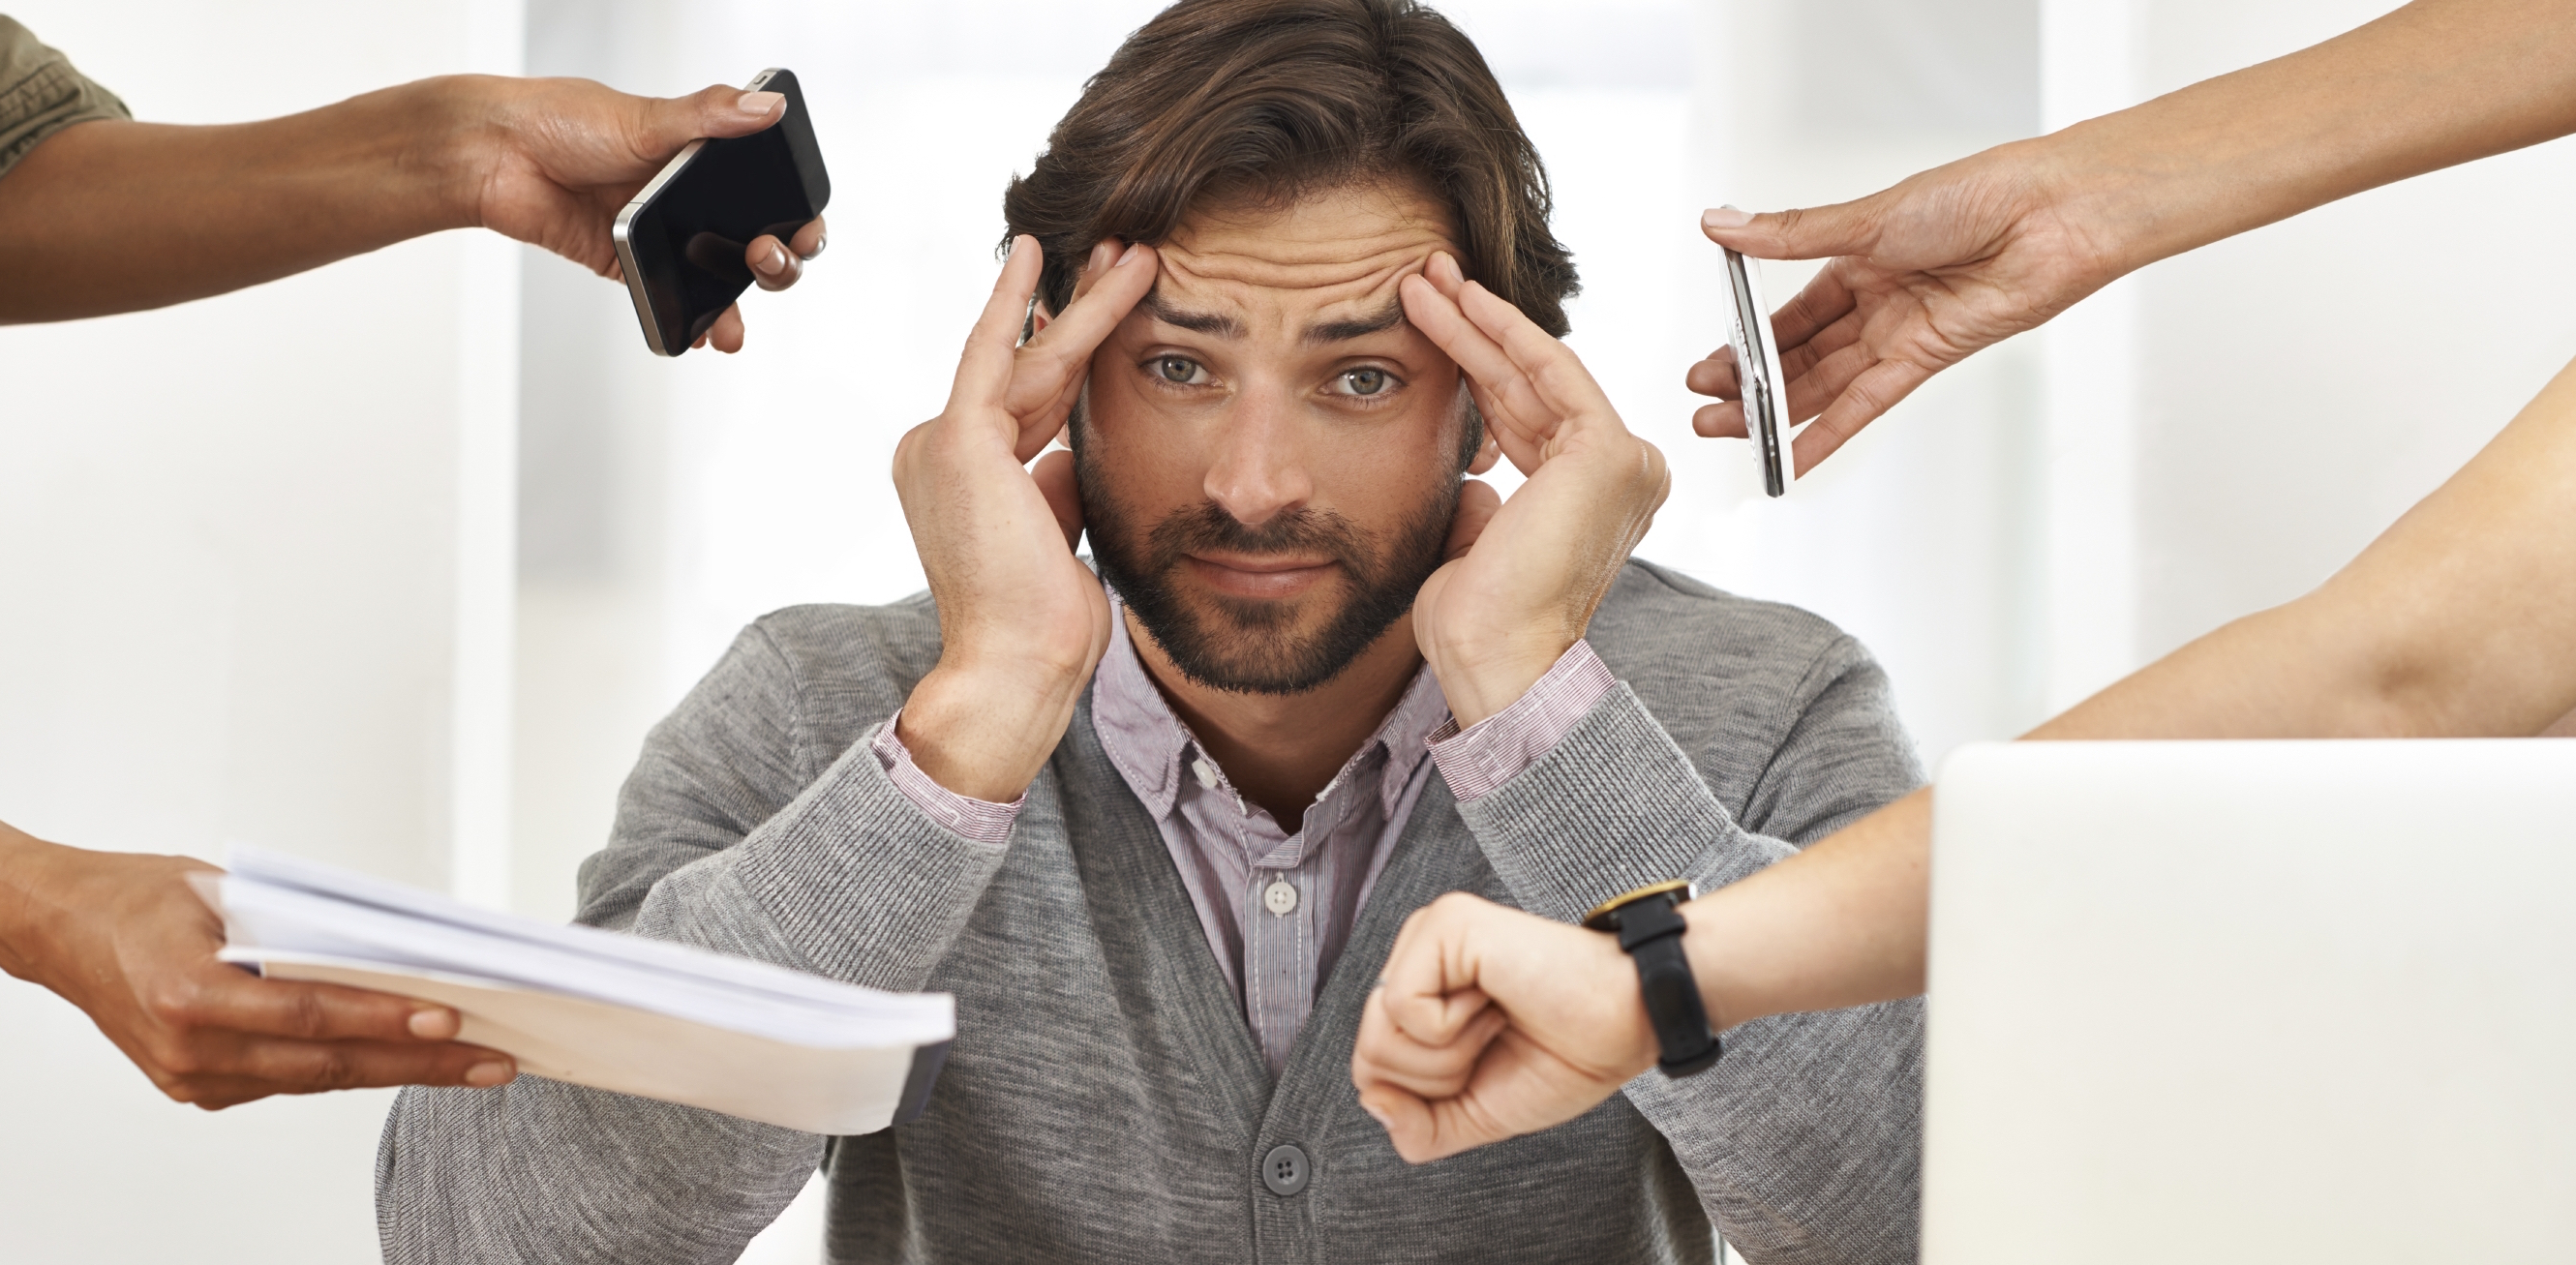 How an Enterprise Social Network can help you reduce stress